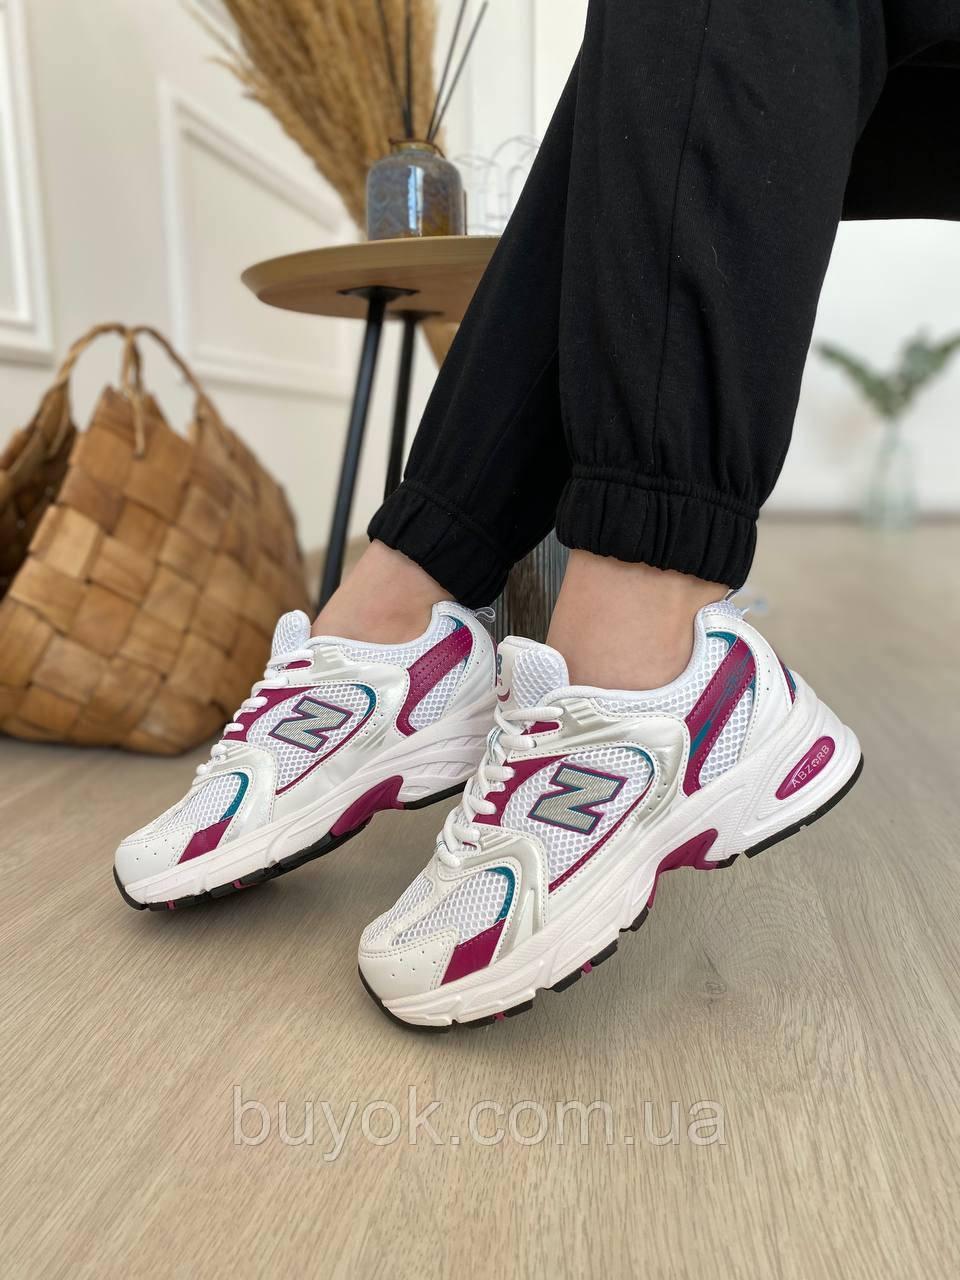 Женские кроссовки New Balance 530 White Pink MR530SF